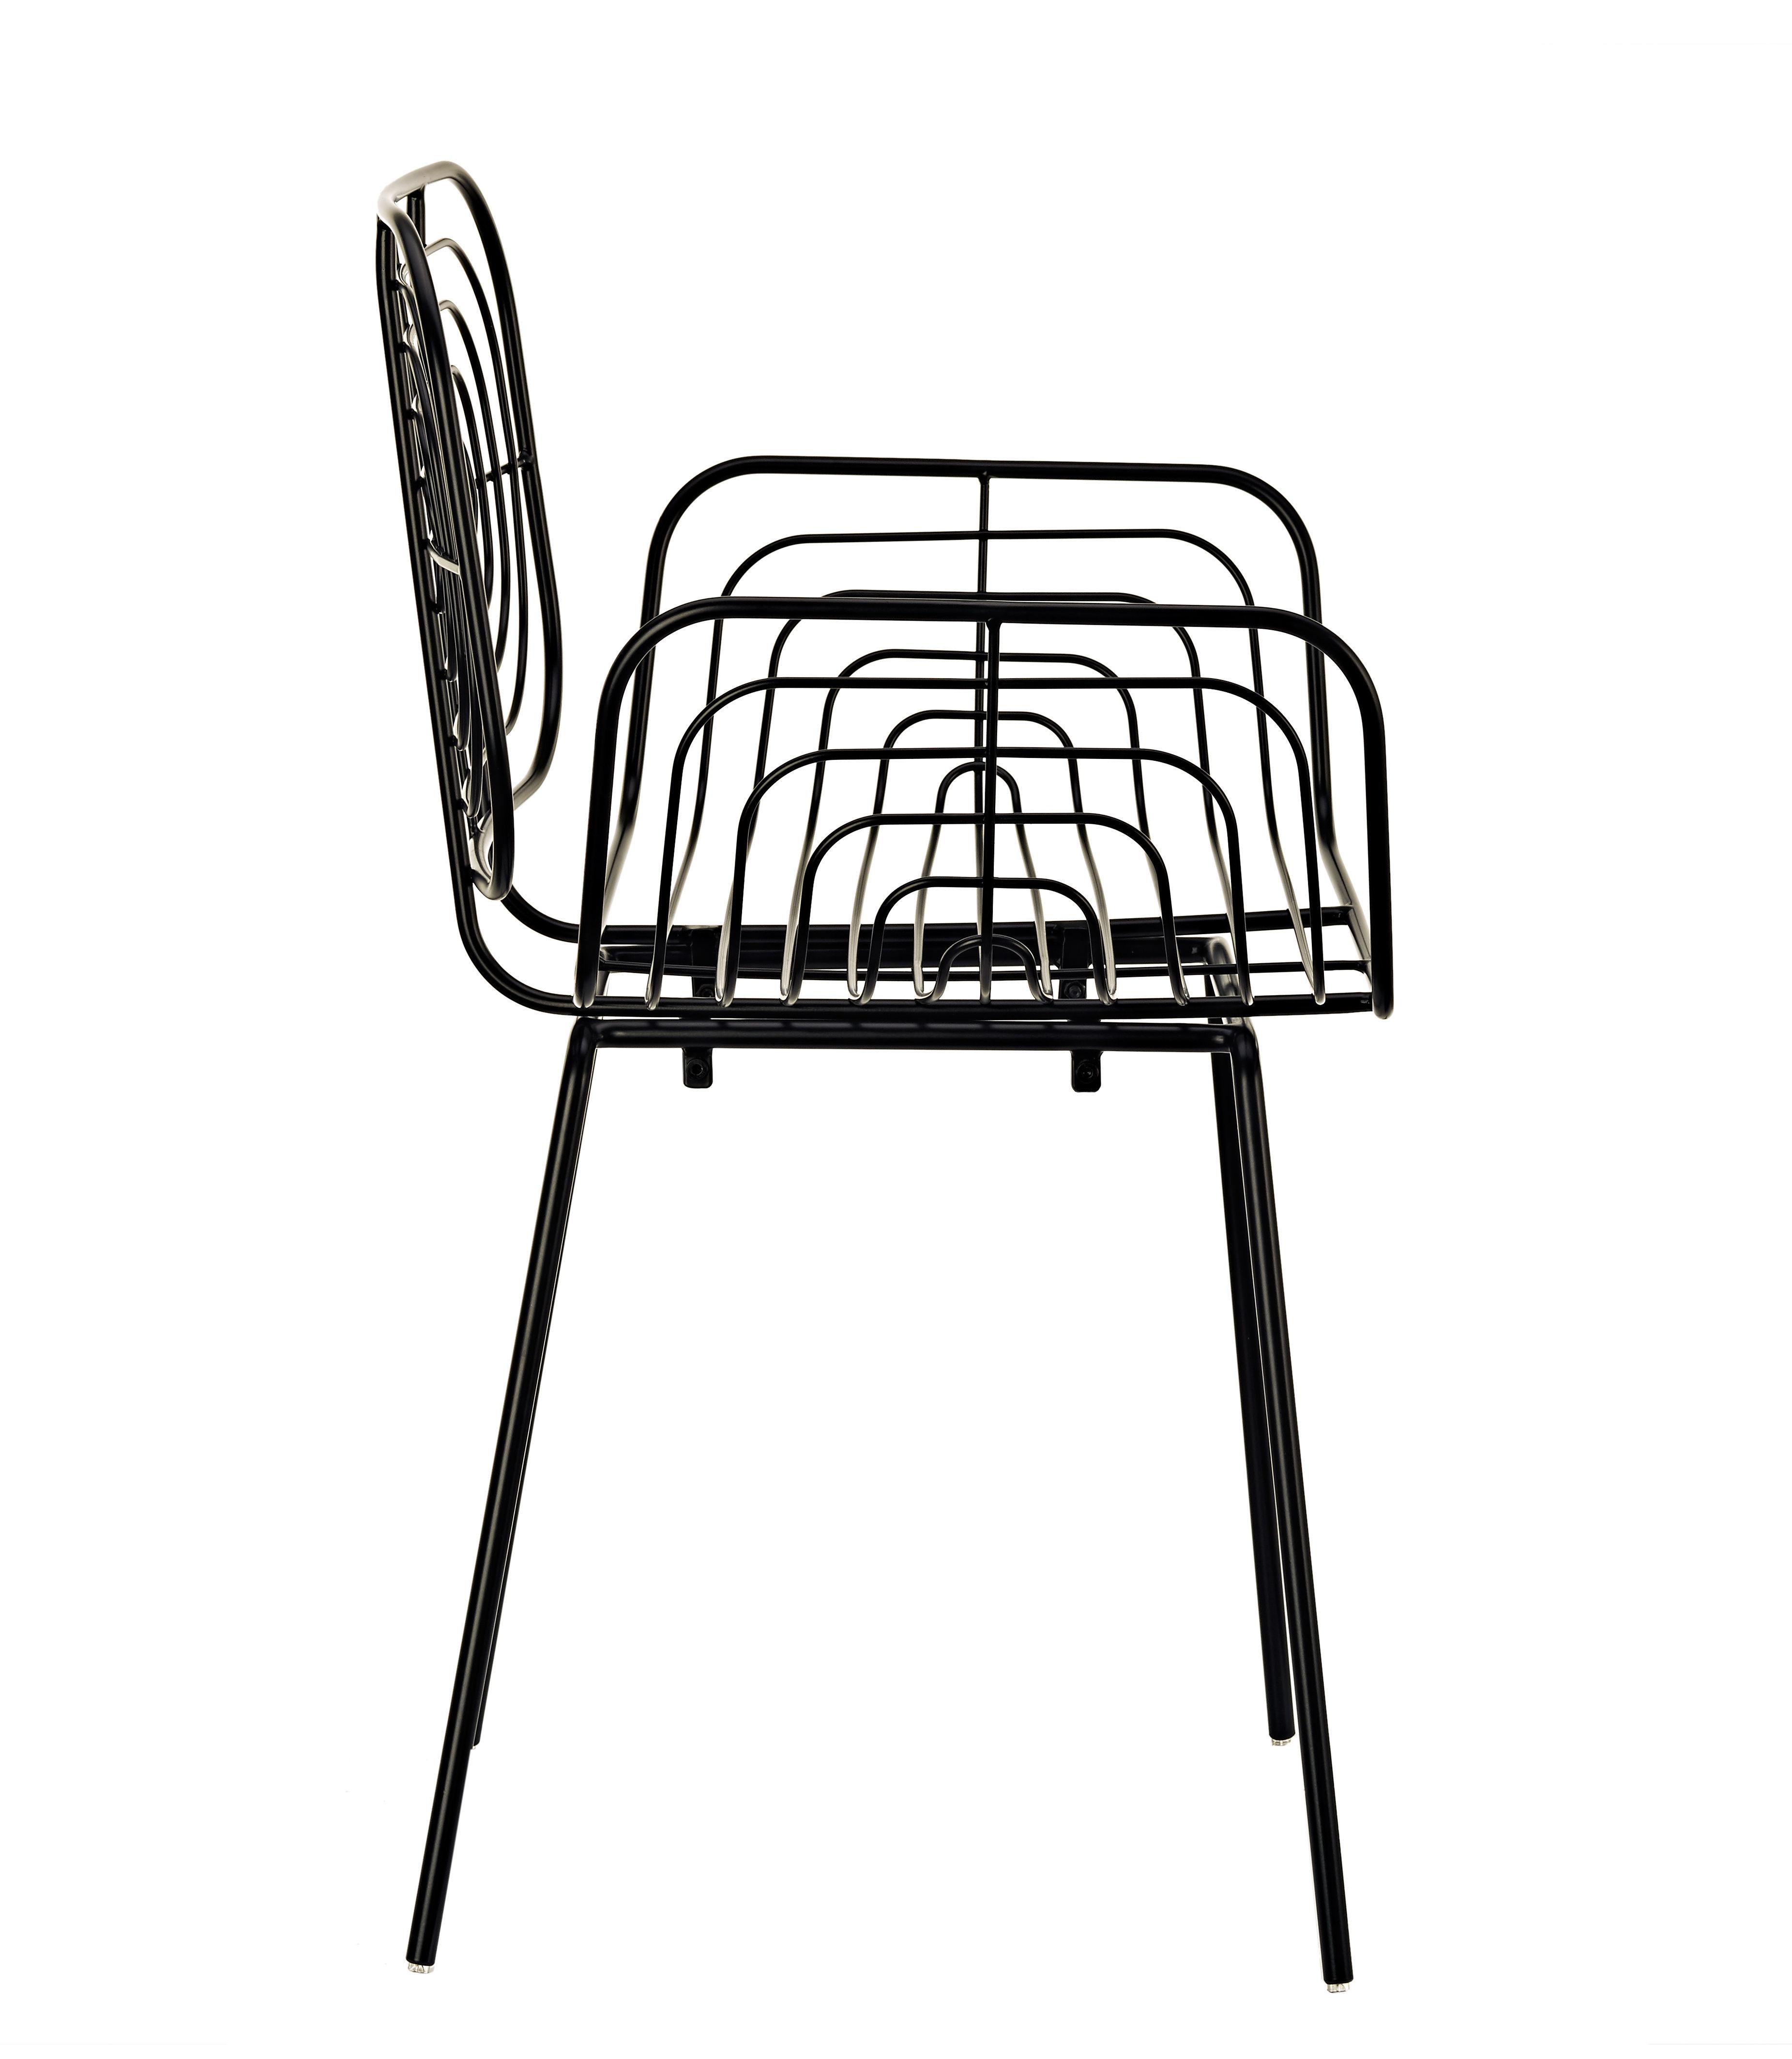 fauteuil boston m tal noir pols potten made in design. Black Bedroom Furniture Sets. Home Design Ideas